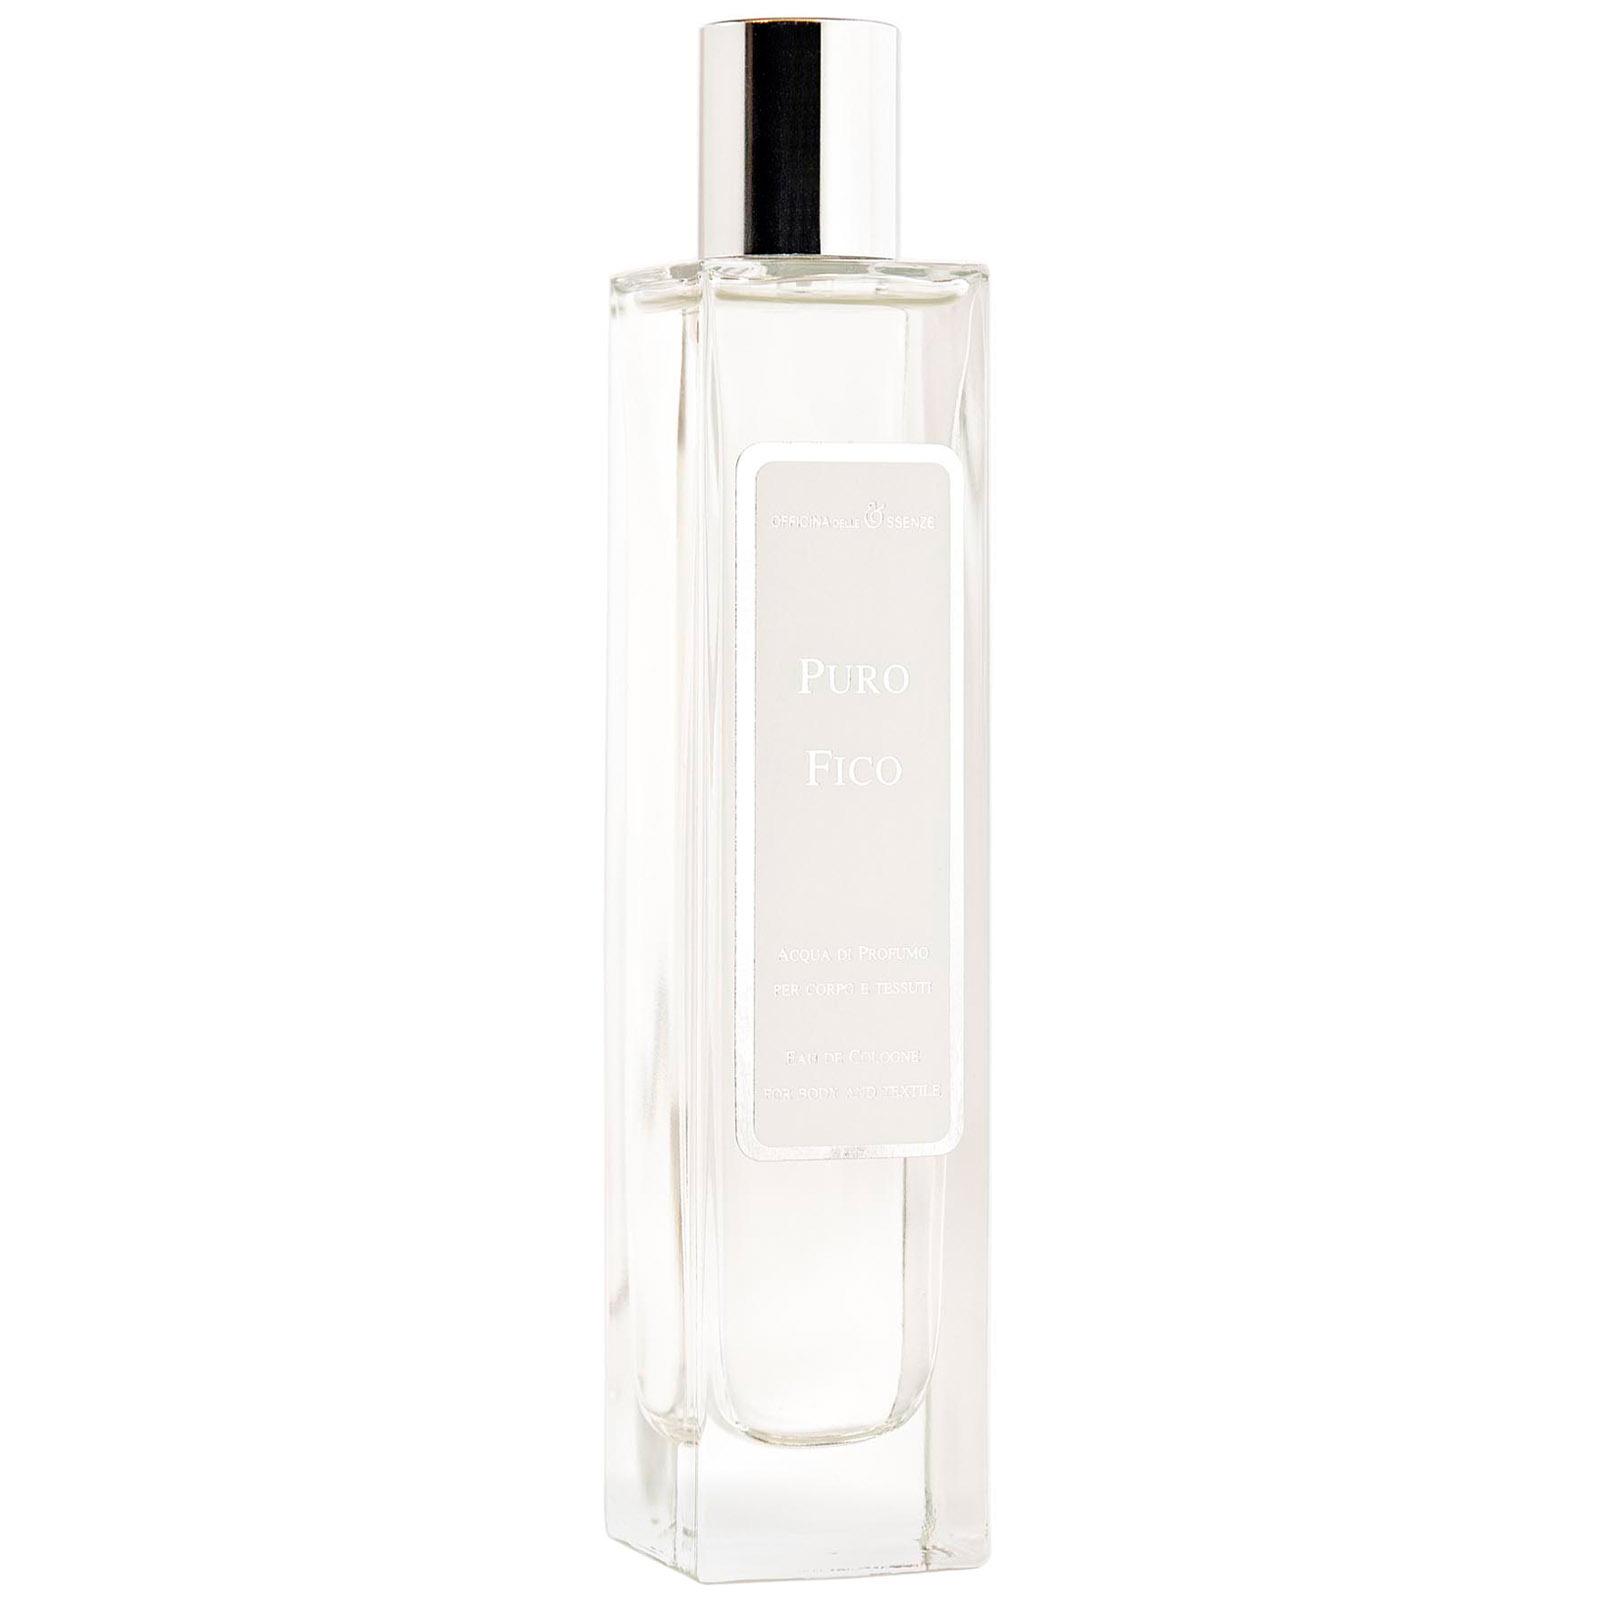 Puro fico profumo eau de cologne 100 ml